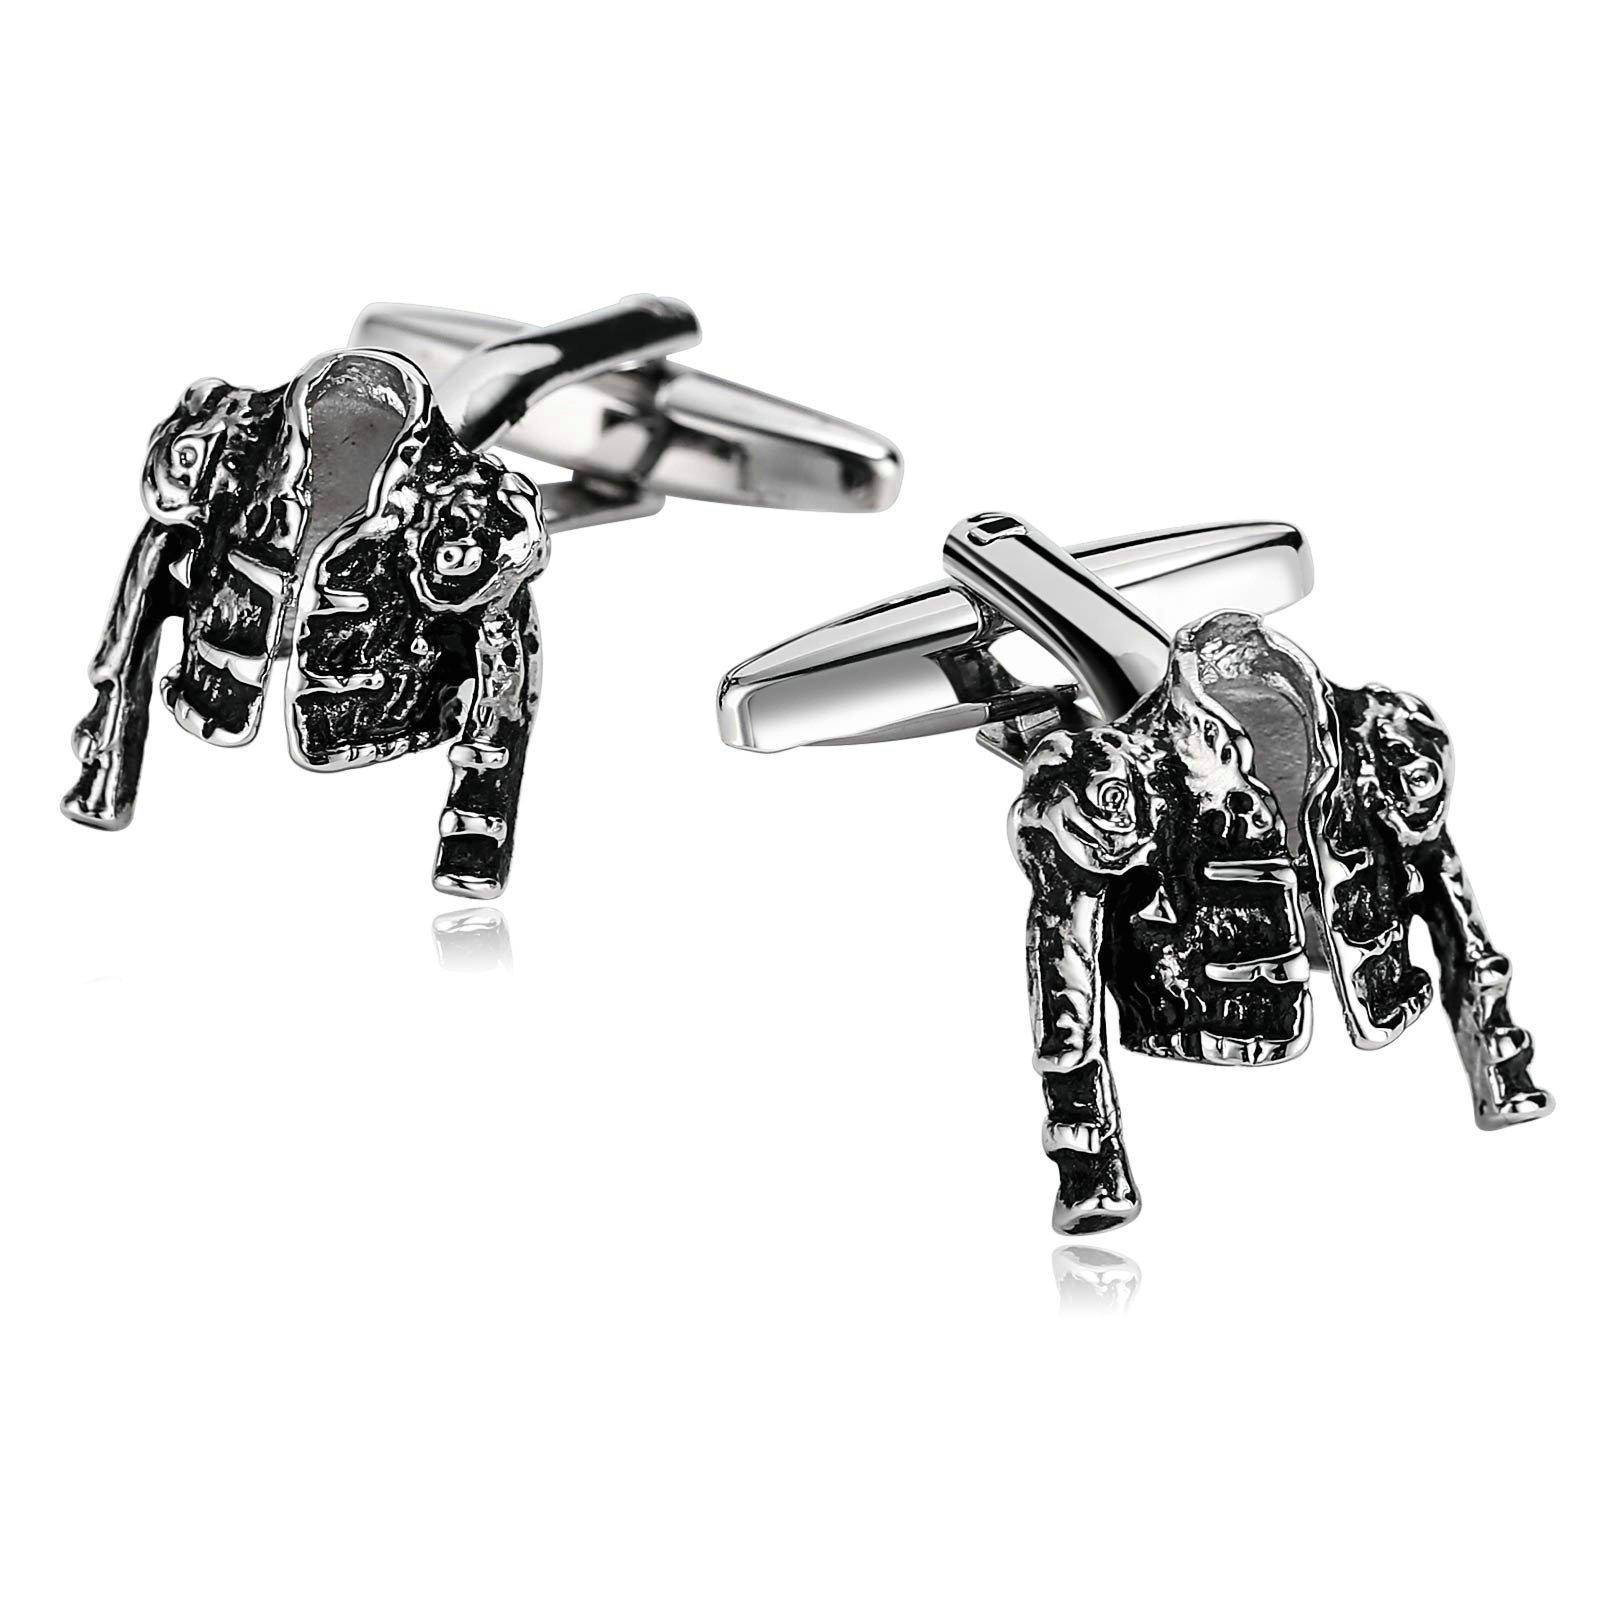 Beydodo Cufflinks for Men Unique Stainless Steel Cufflinks for Men Silver Black Jacket Vest